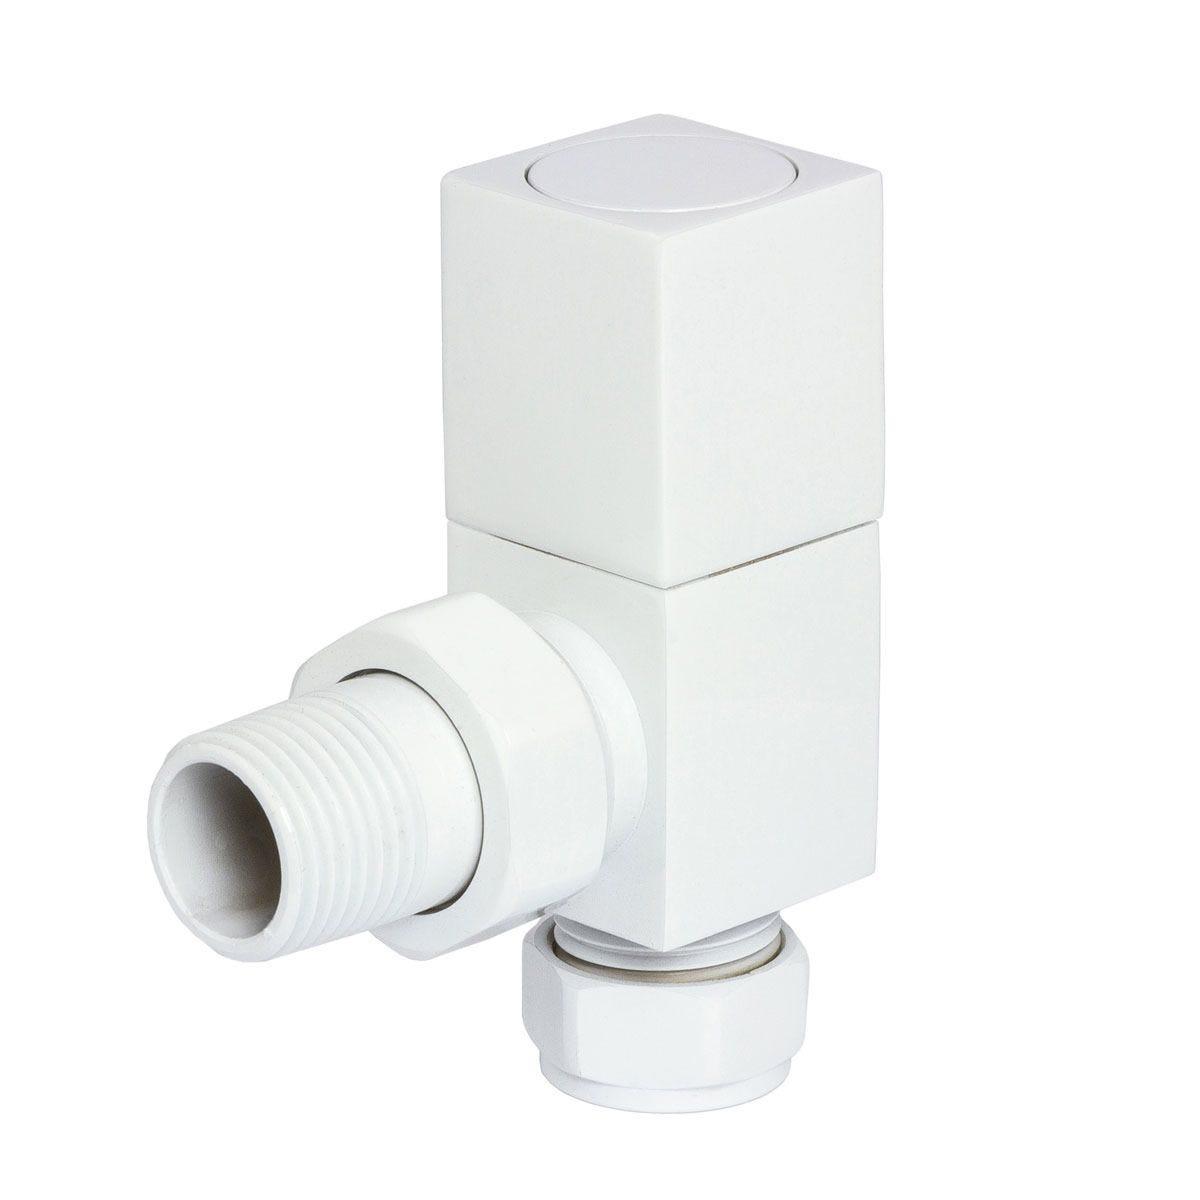 Heating Style Square Angled Radiator Valves - White